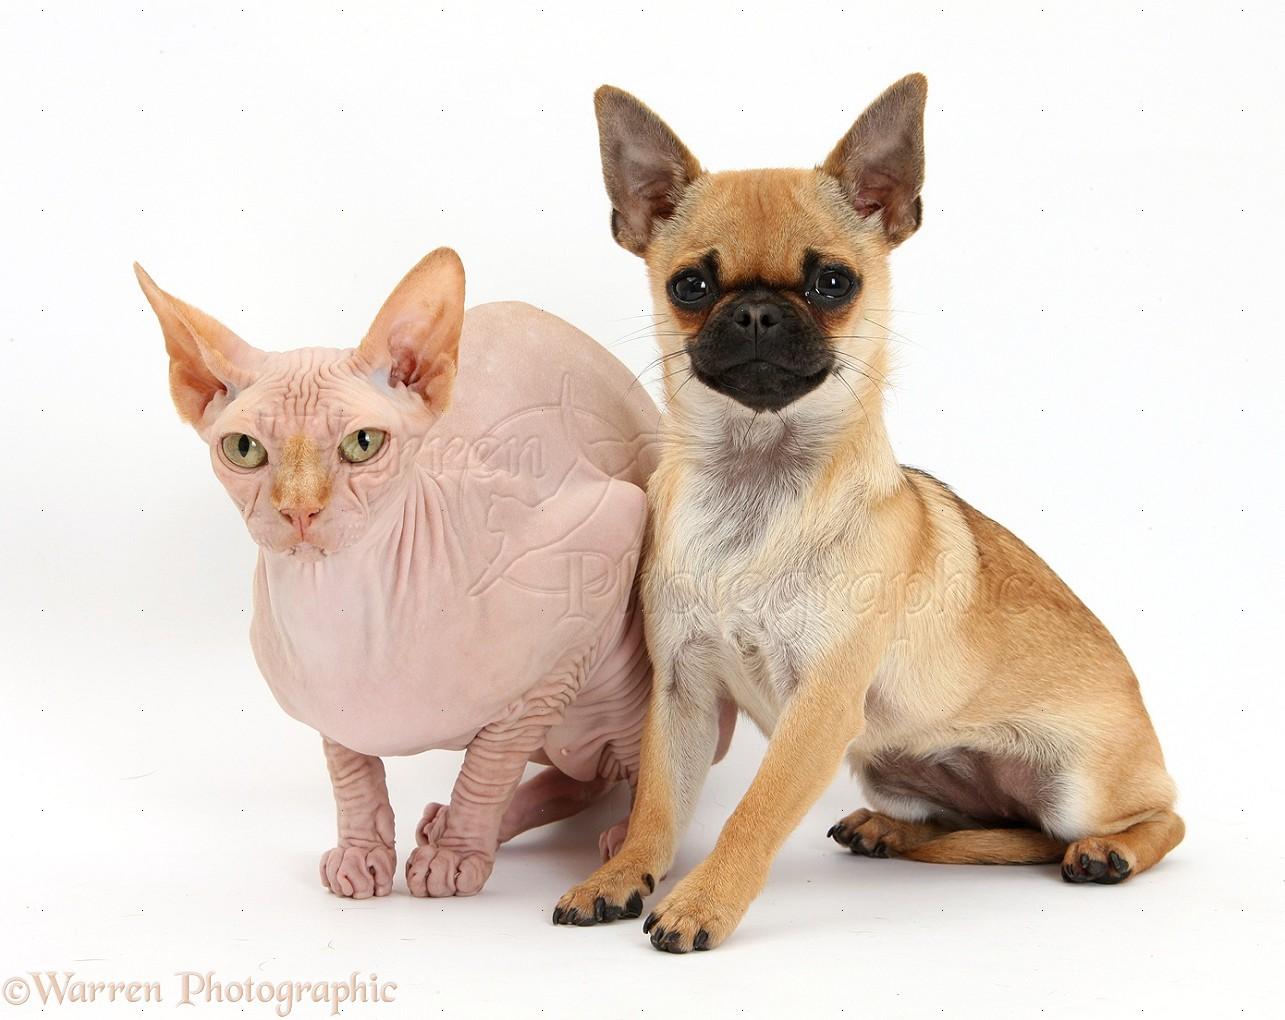 Pets: Chug (Pug x Chihuahua) bitch and Sphynx cat photo ...